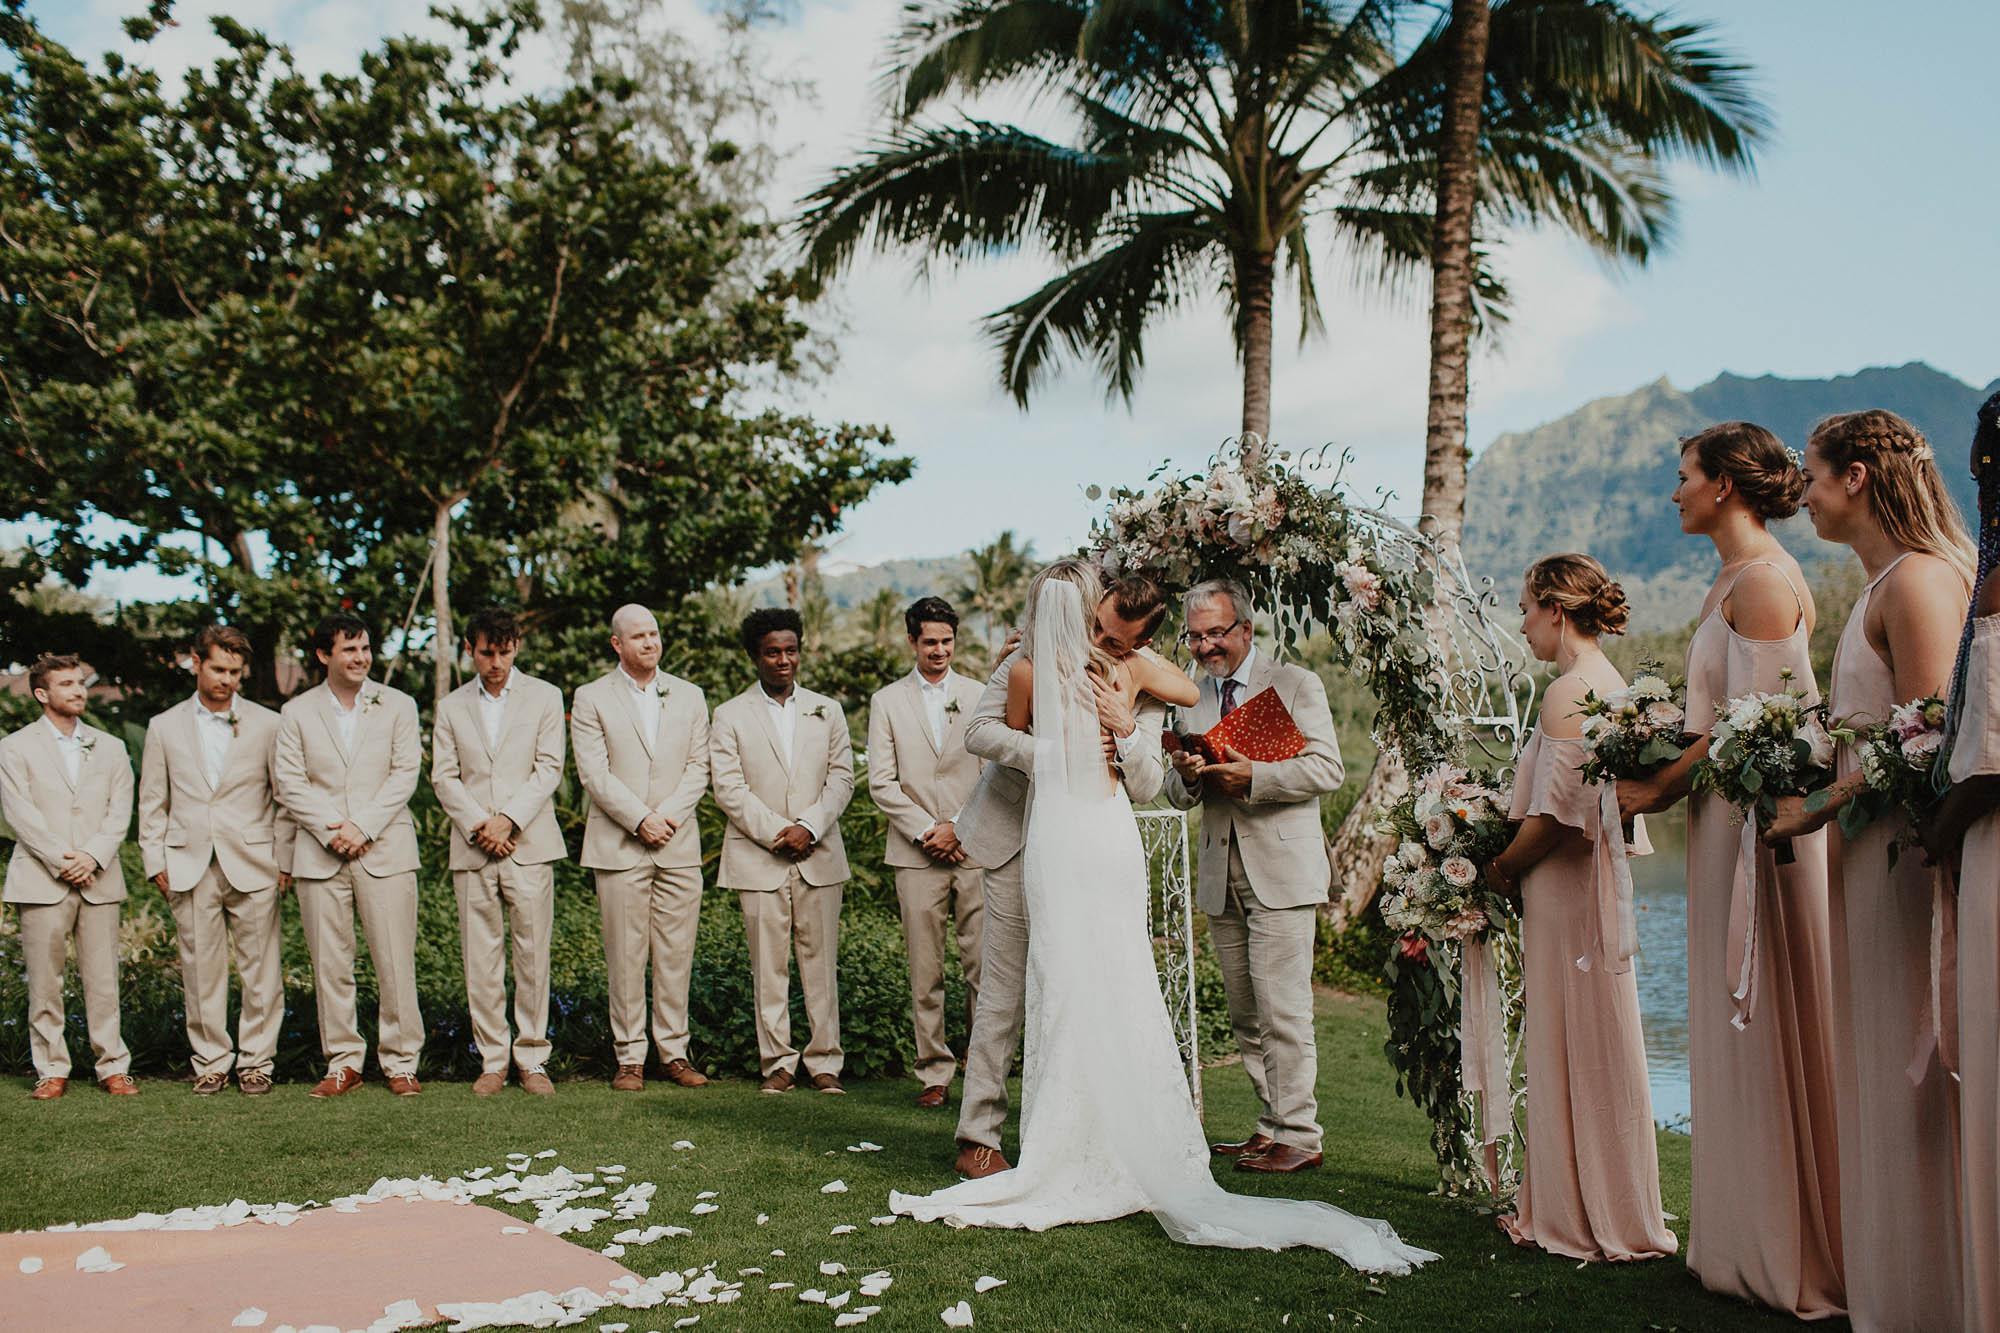 Saying vows under arch our destination kauai wedding